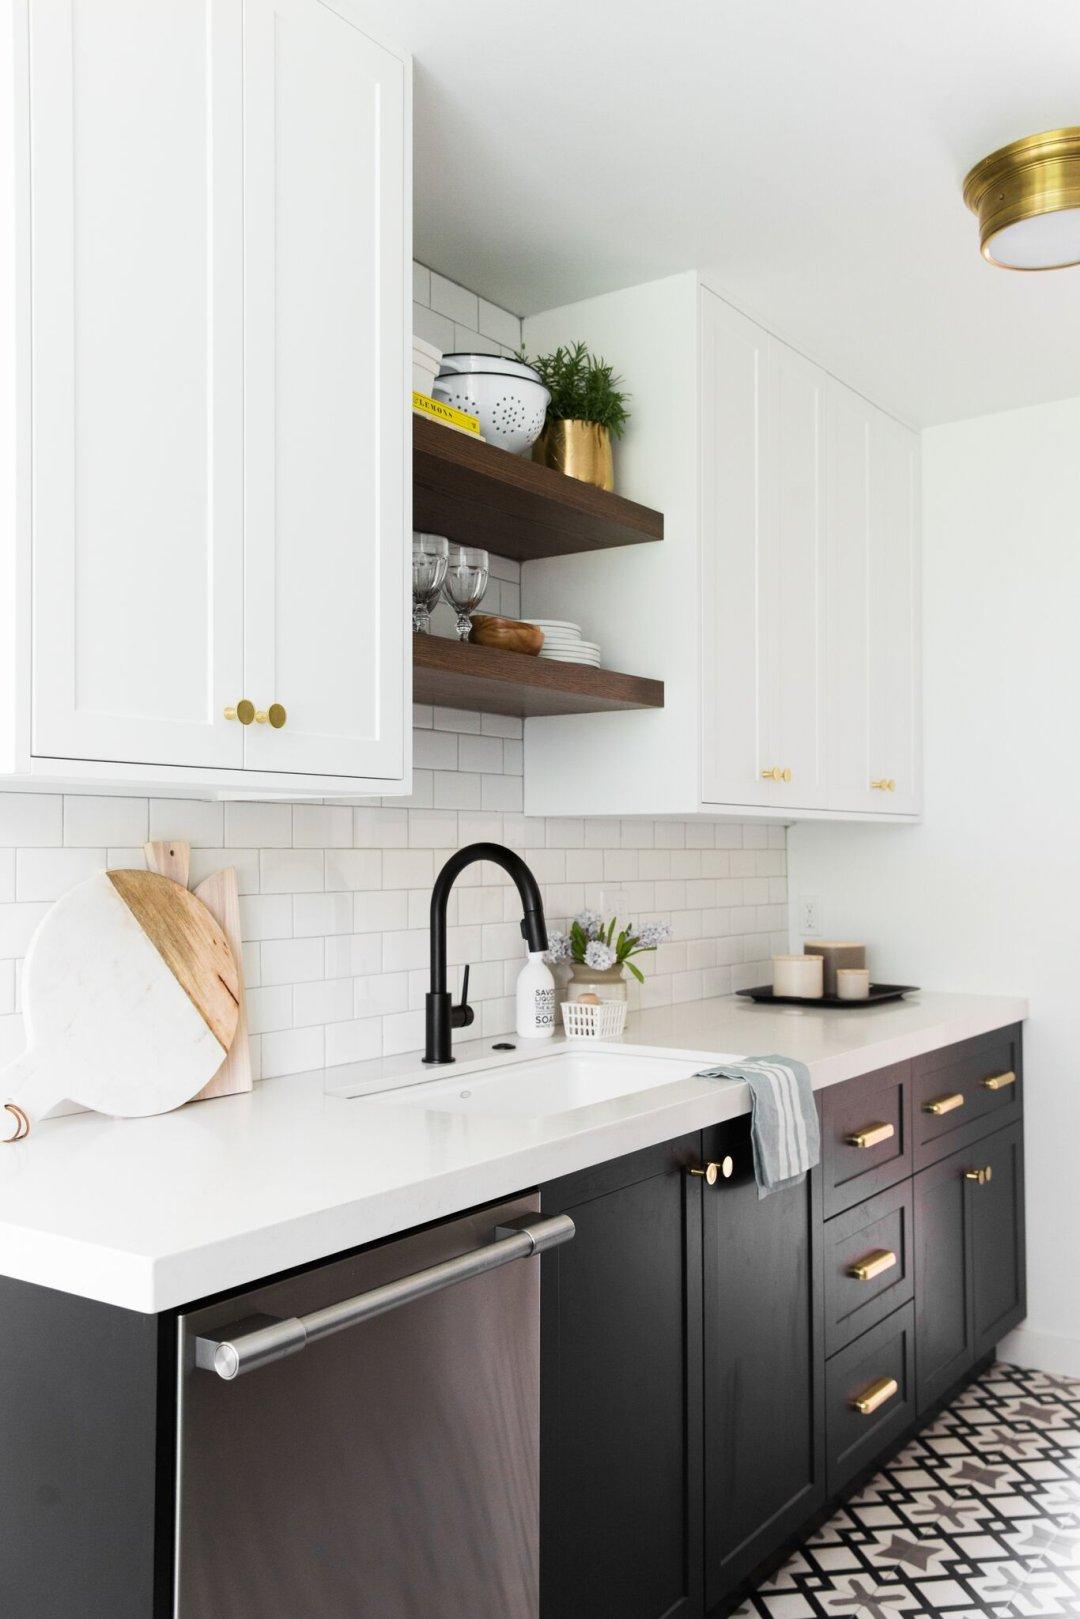 Ideas To Remodel Kitchen: Hillside Kitchen Remodel Reveal